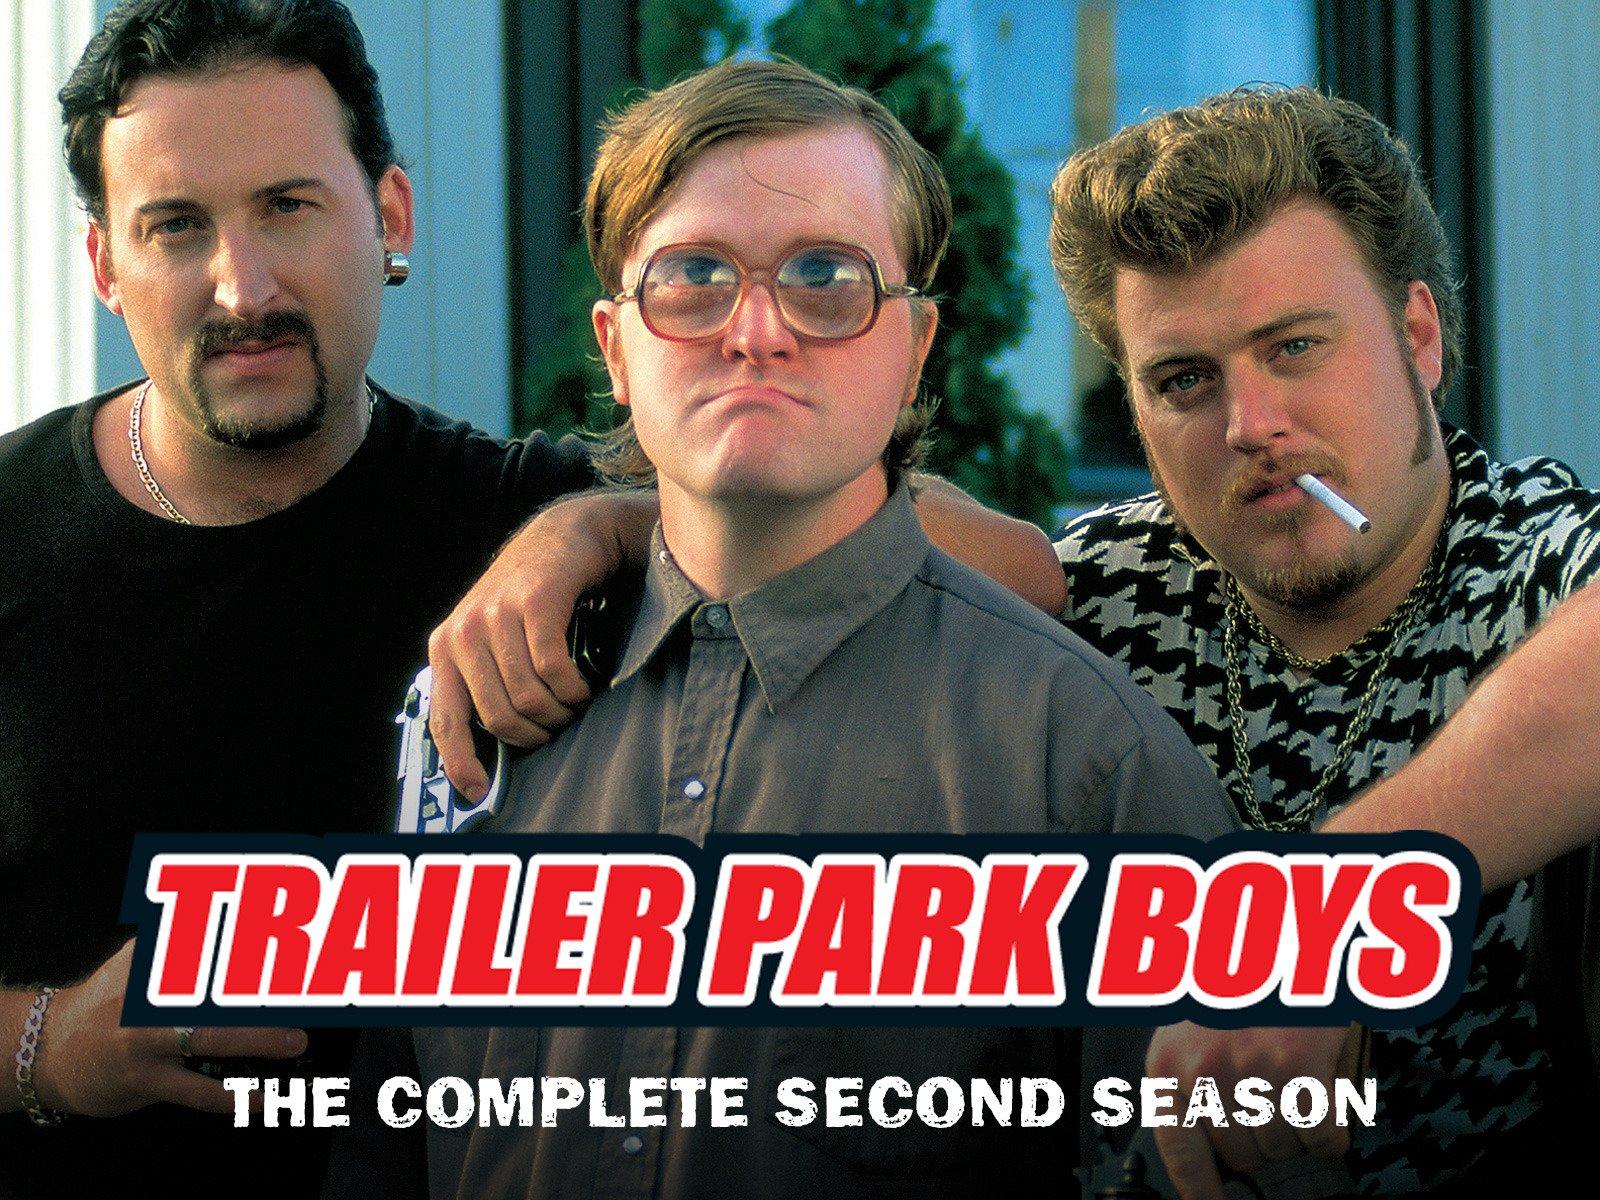 Watch Trailer Park Boys Season 1 Prime Video